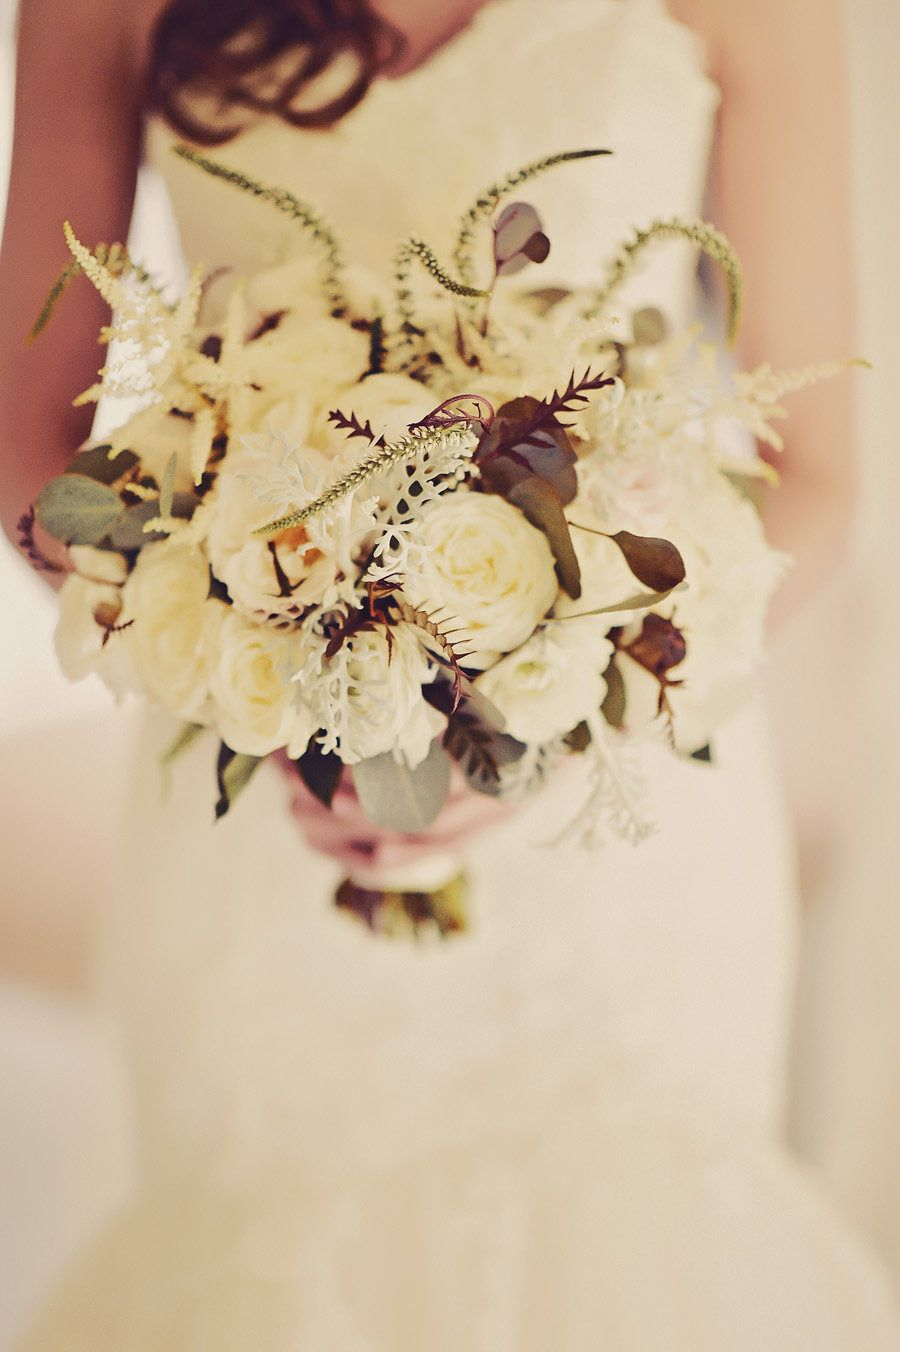 Photography: Tamiz Photography - www.tamizphotography.com/  Read More: http://www.stylemepretty.com/destination-weddings/2015/04/08/elegant-maui-destination-wedding/